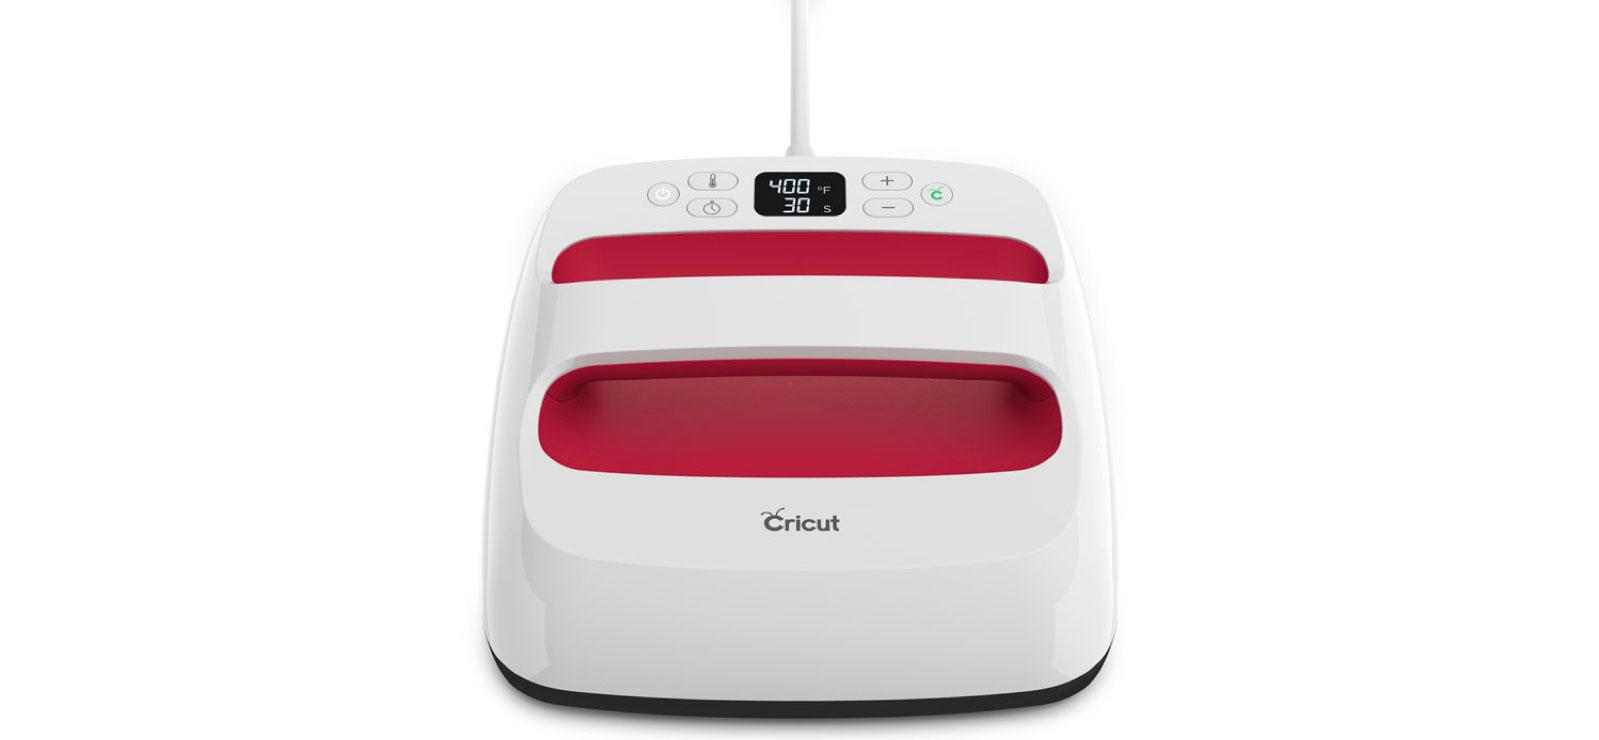 Cricut EasyPress 2 - best Cricut machine